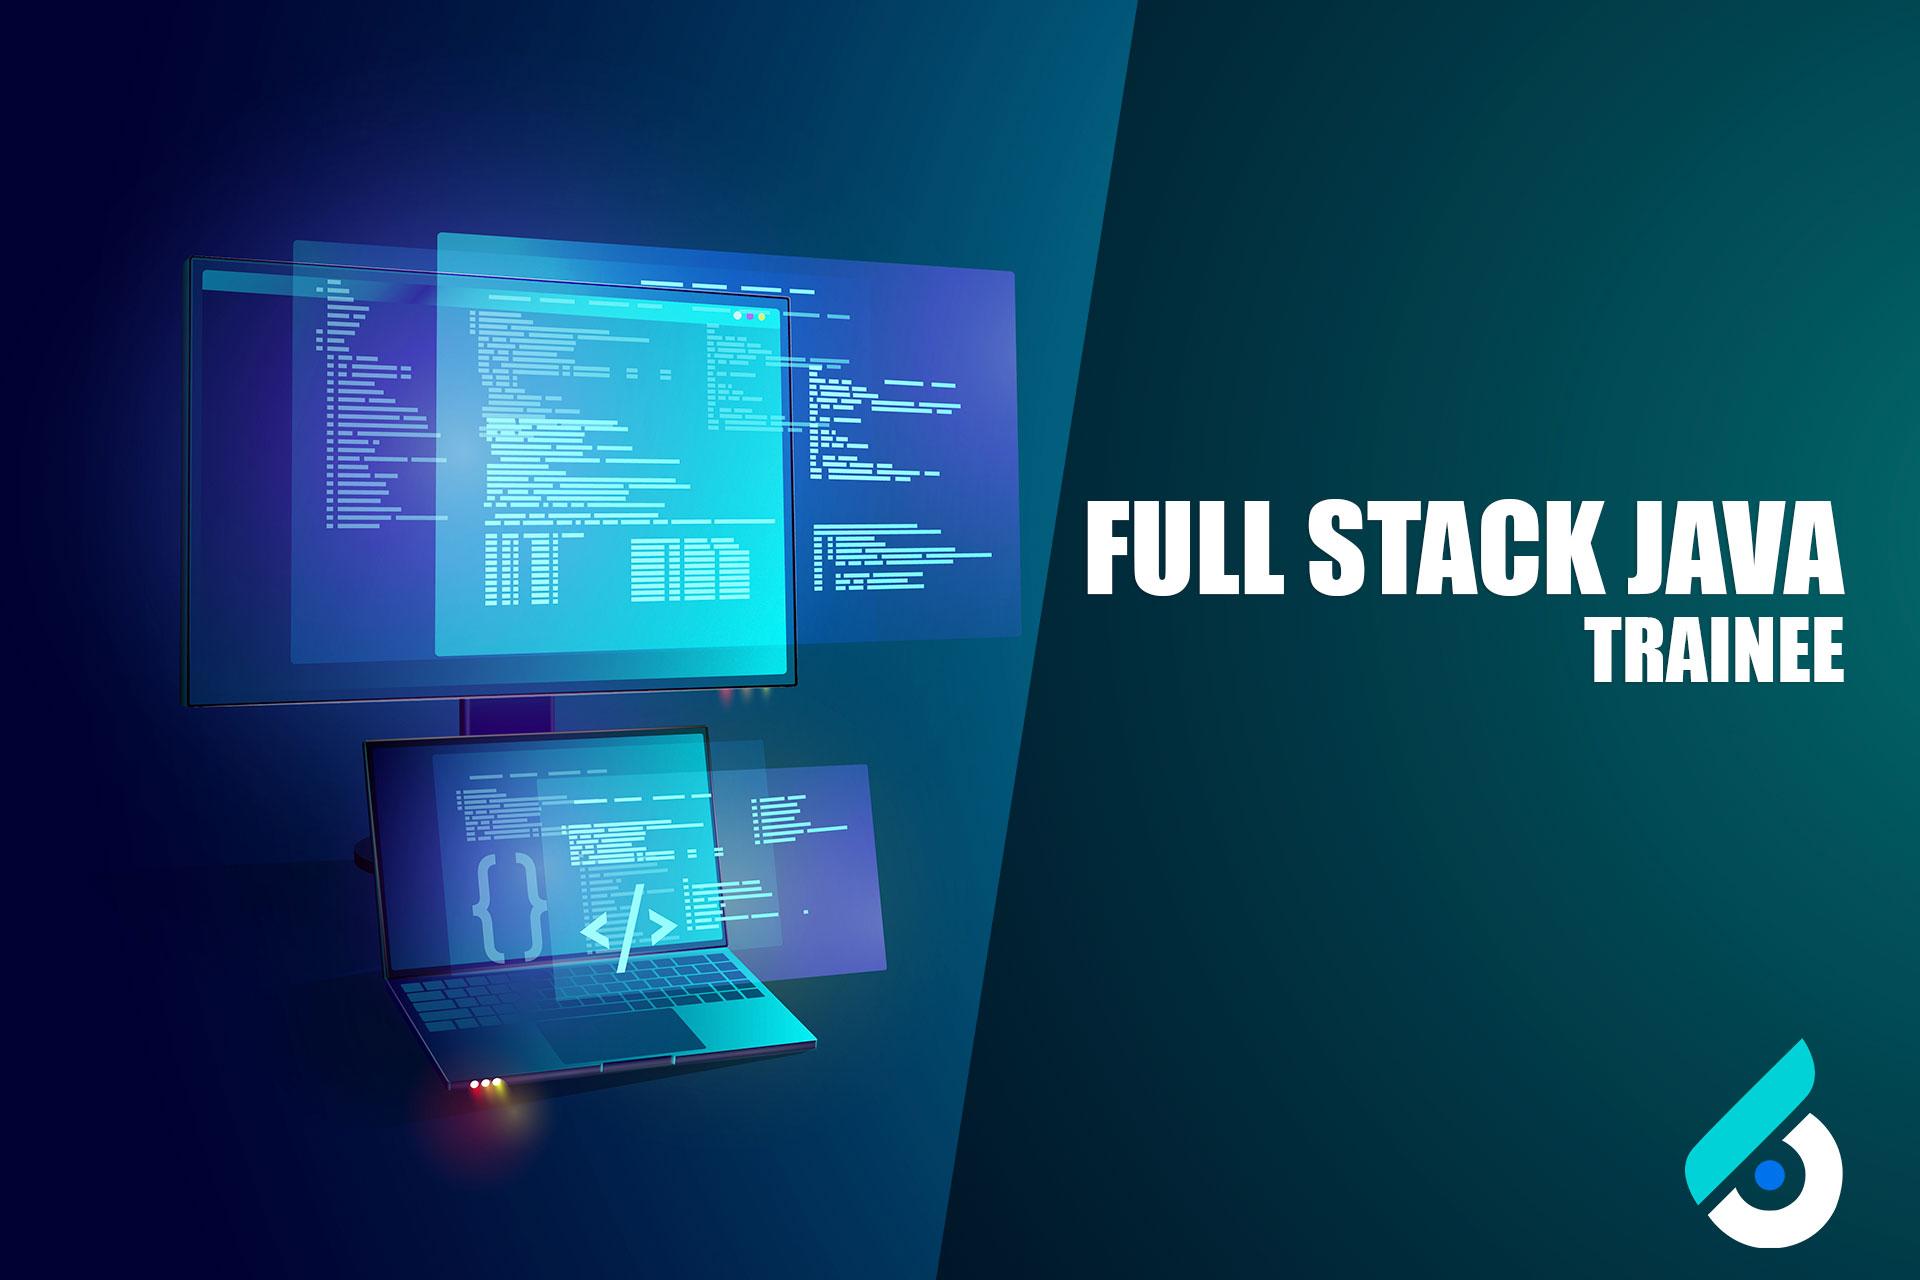 RLAB-20-01-13-0156-3 | Desarrollo de Aplicaciones Full Stack Java Trainee